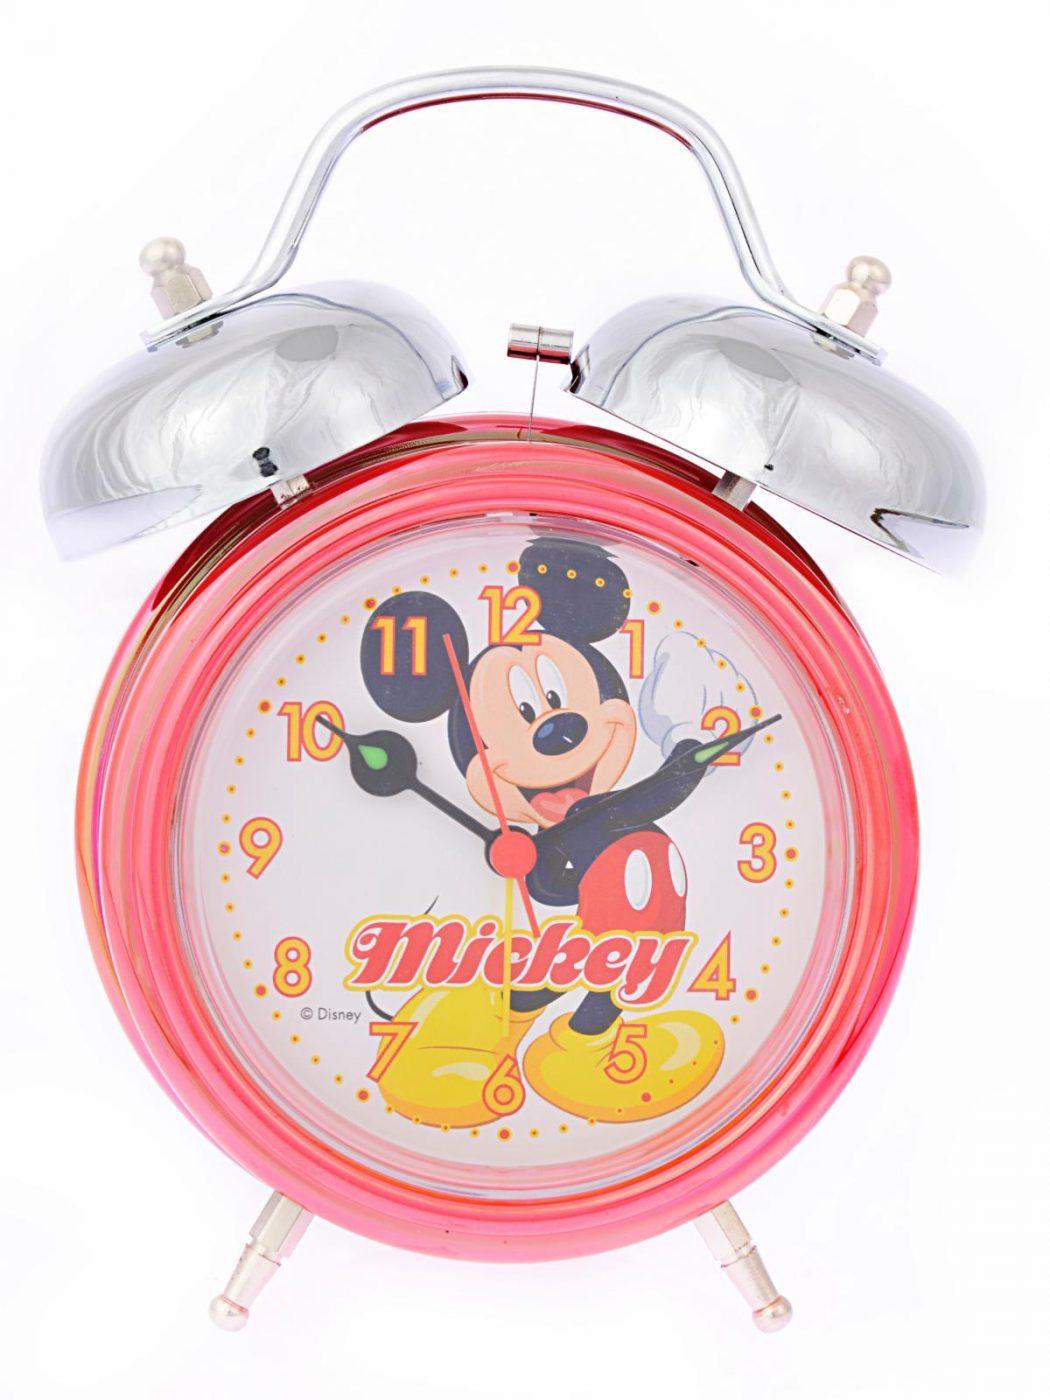 10823_1-disney-mickey-alarm-clock 15 Creative giveaways ideas for kids